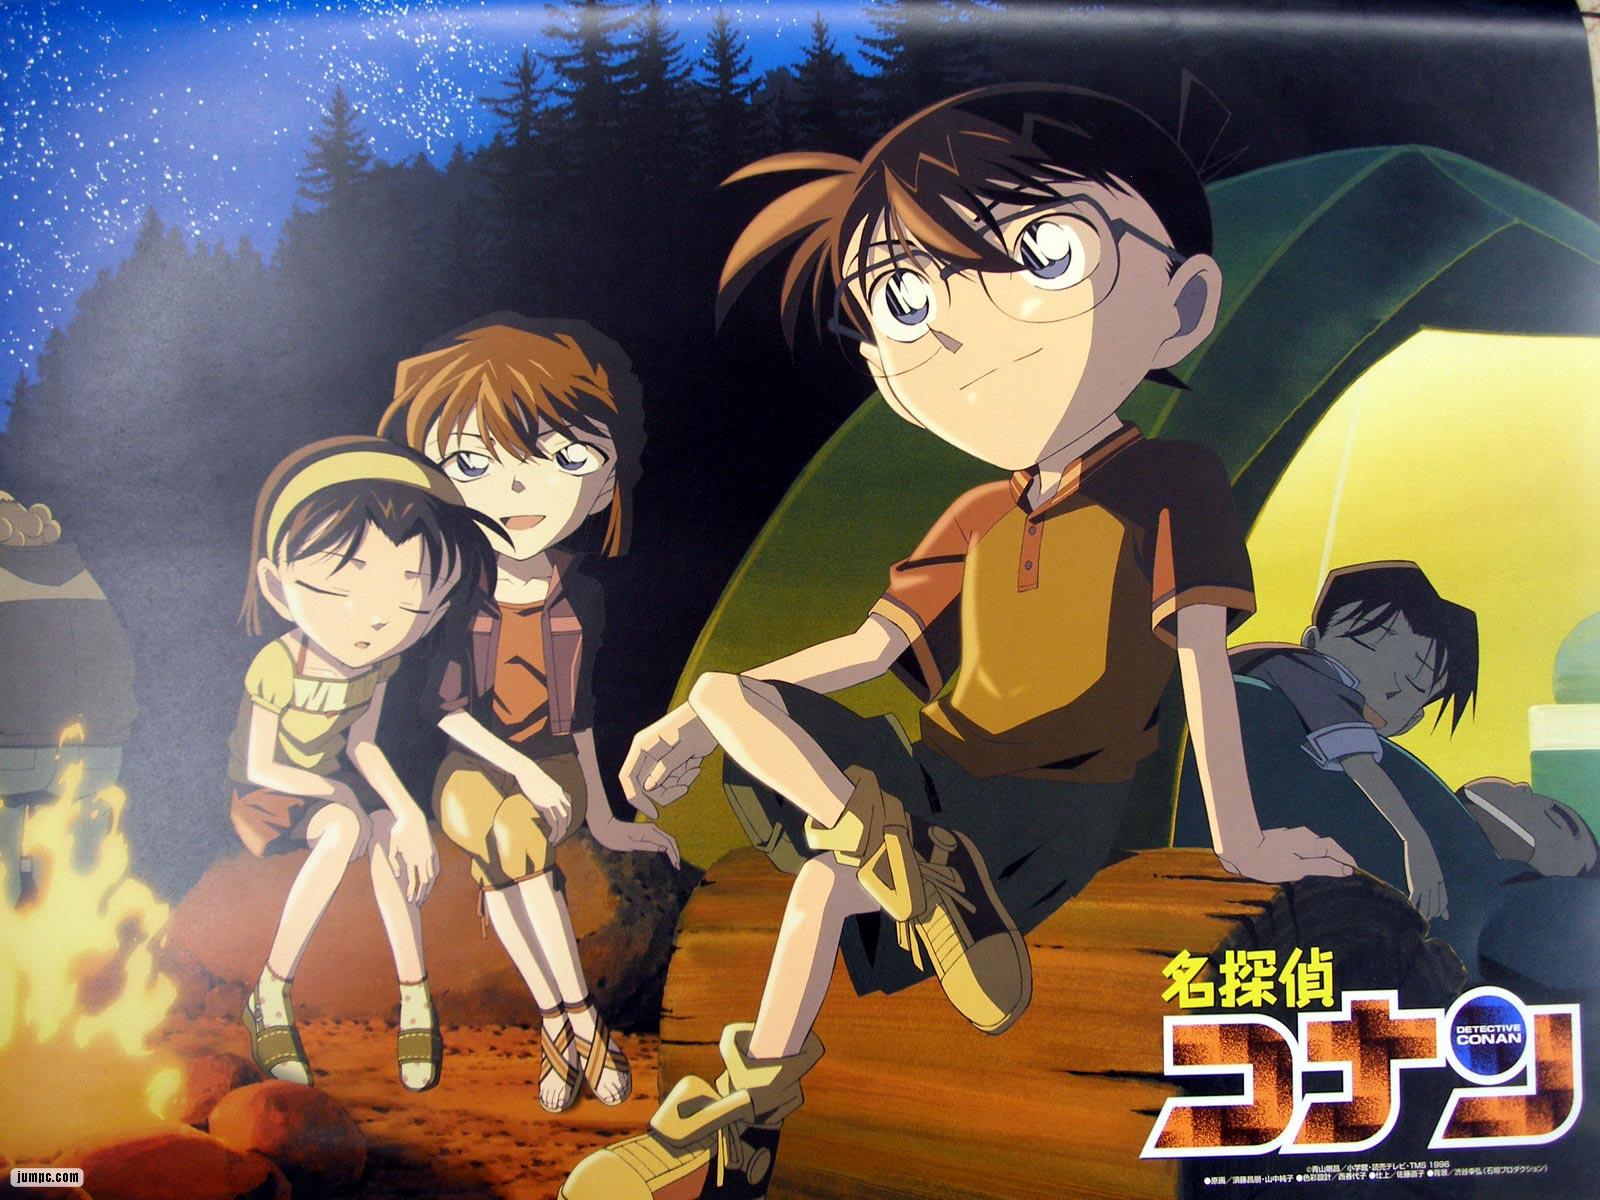 Detective Conan Wallpaper 1600x1200 Detective Conan 1600x1200